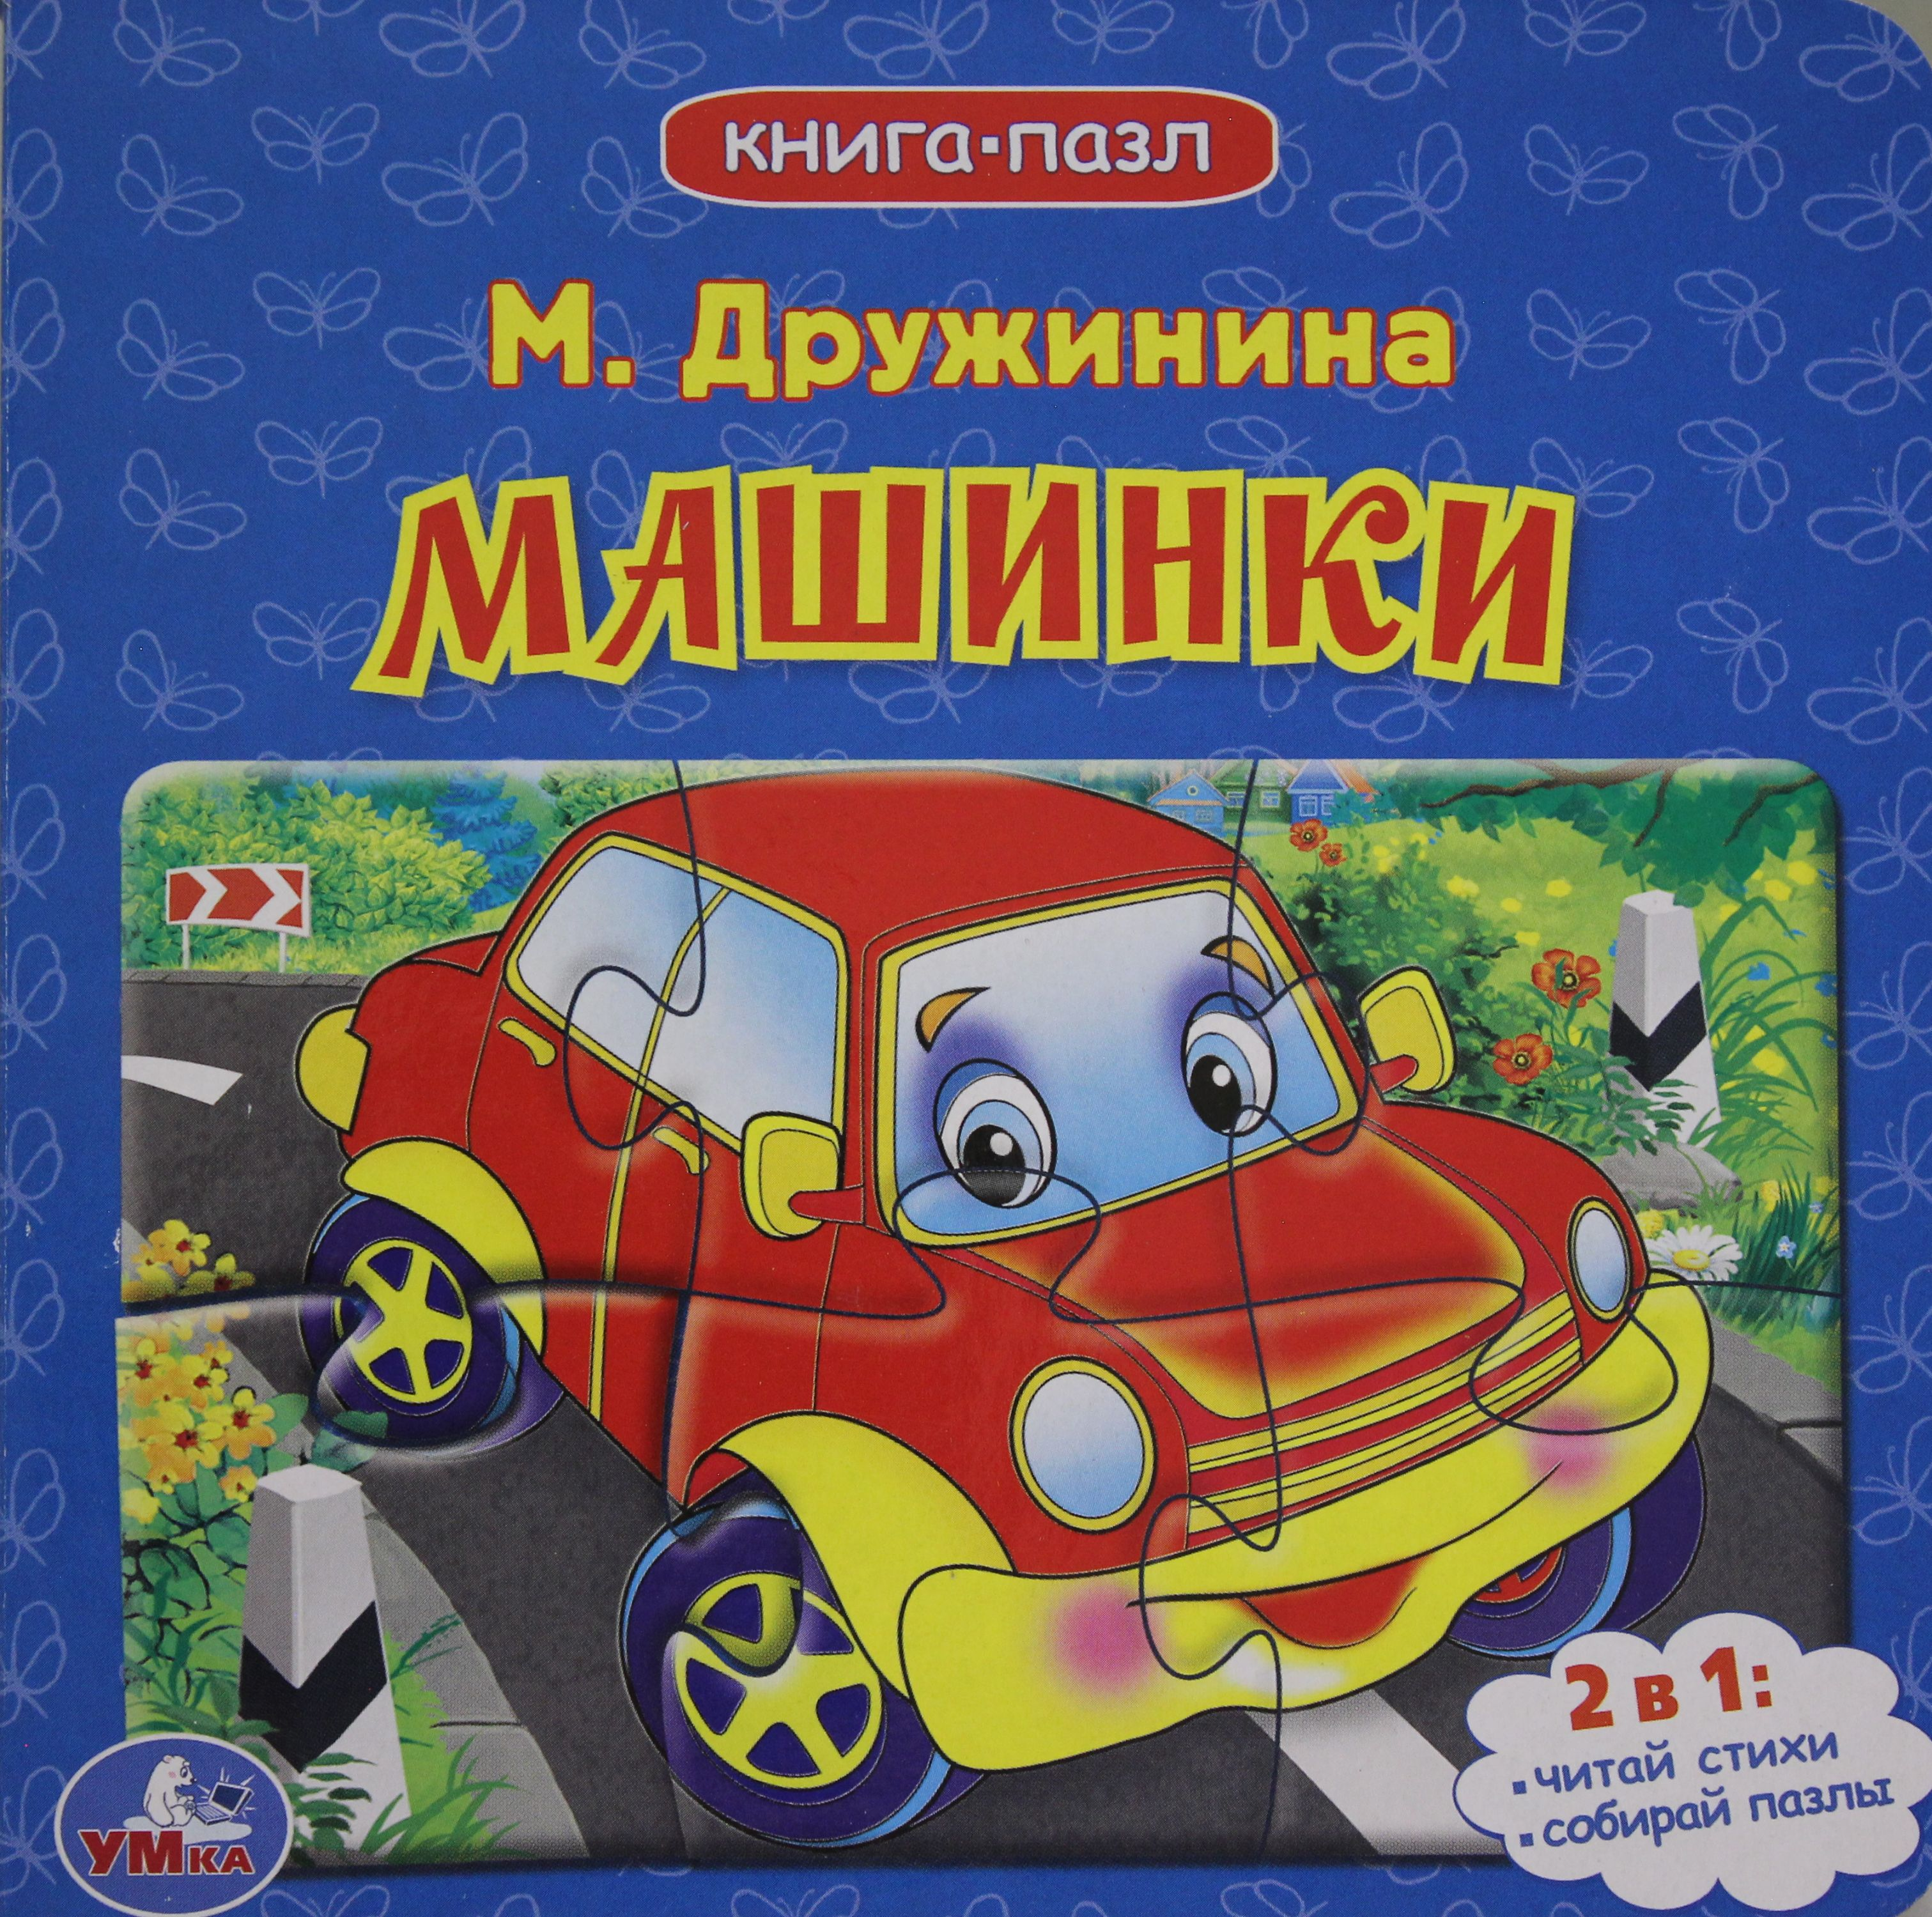 MASHINKI